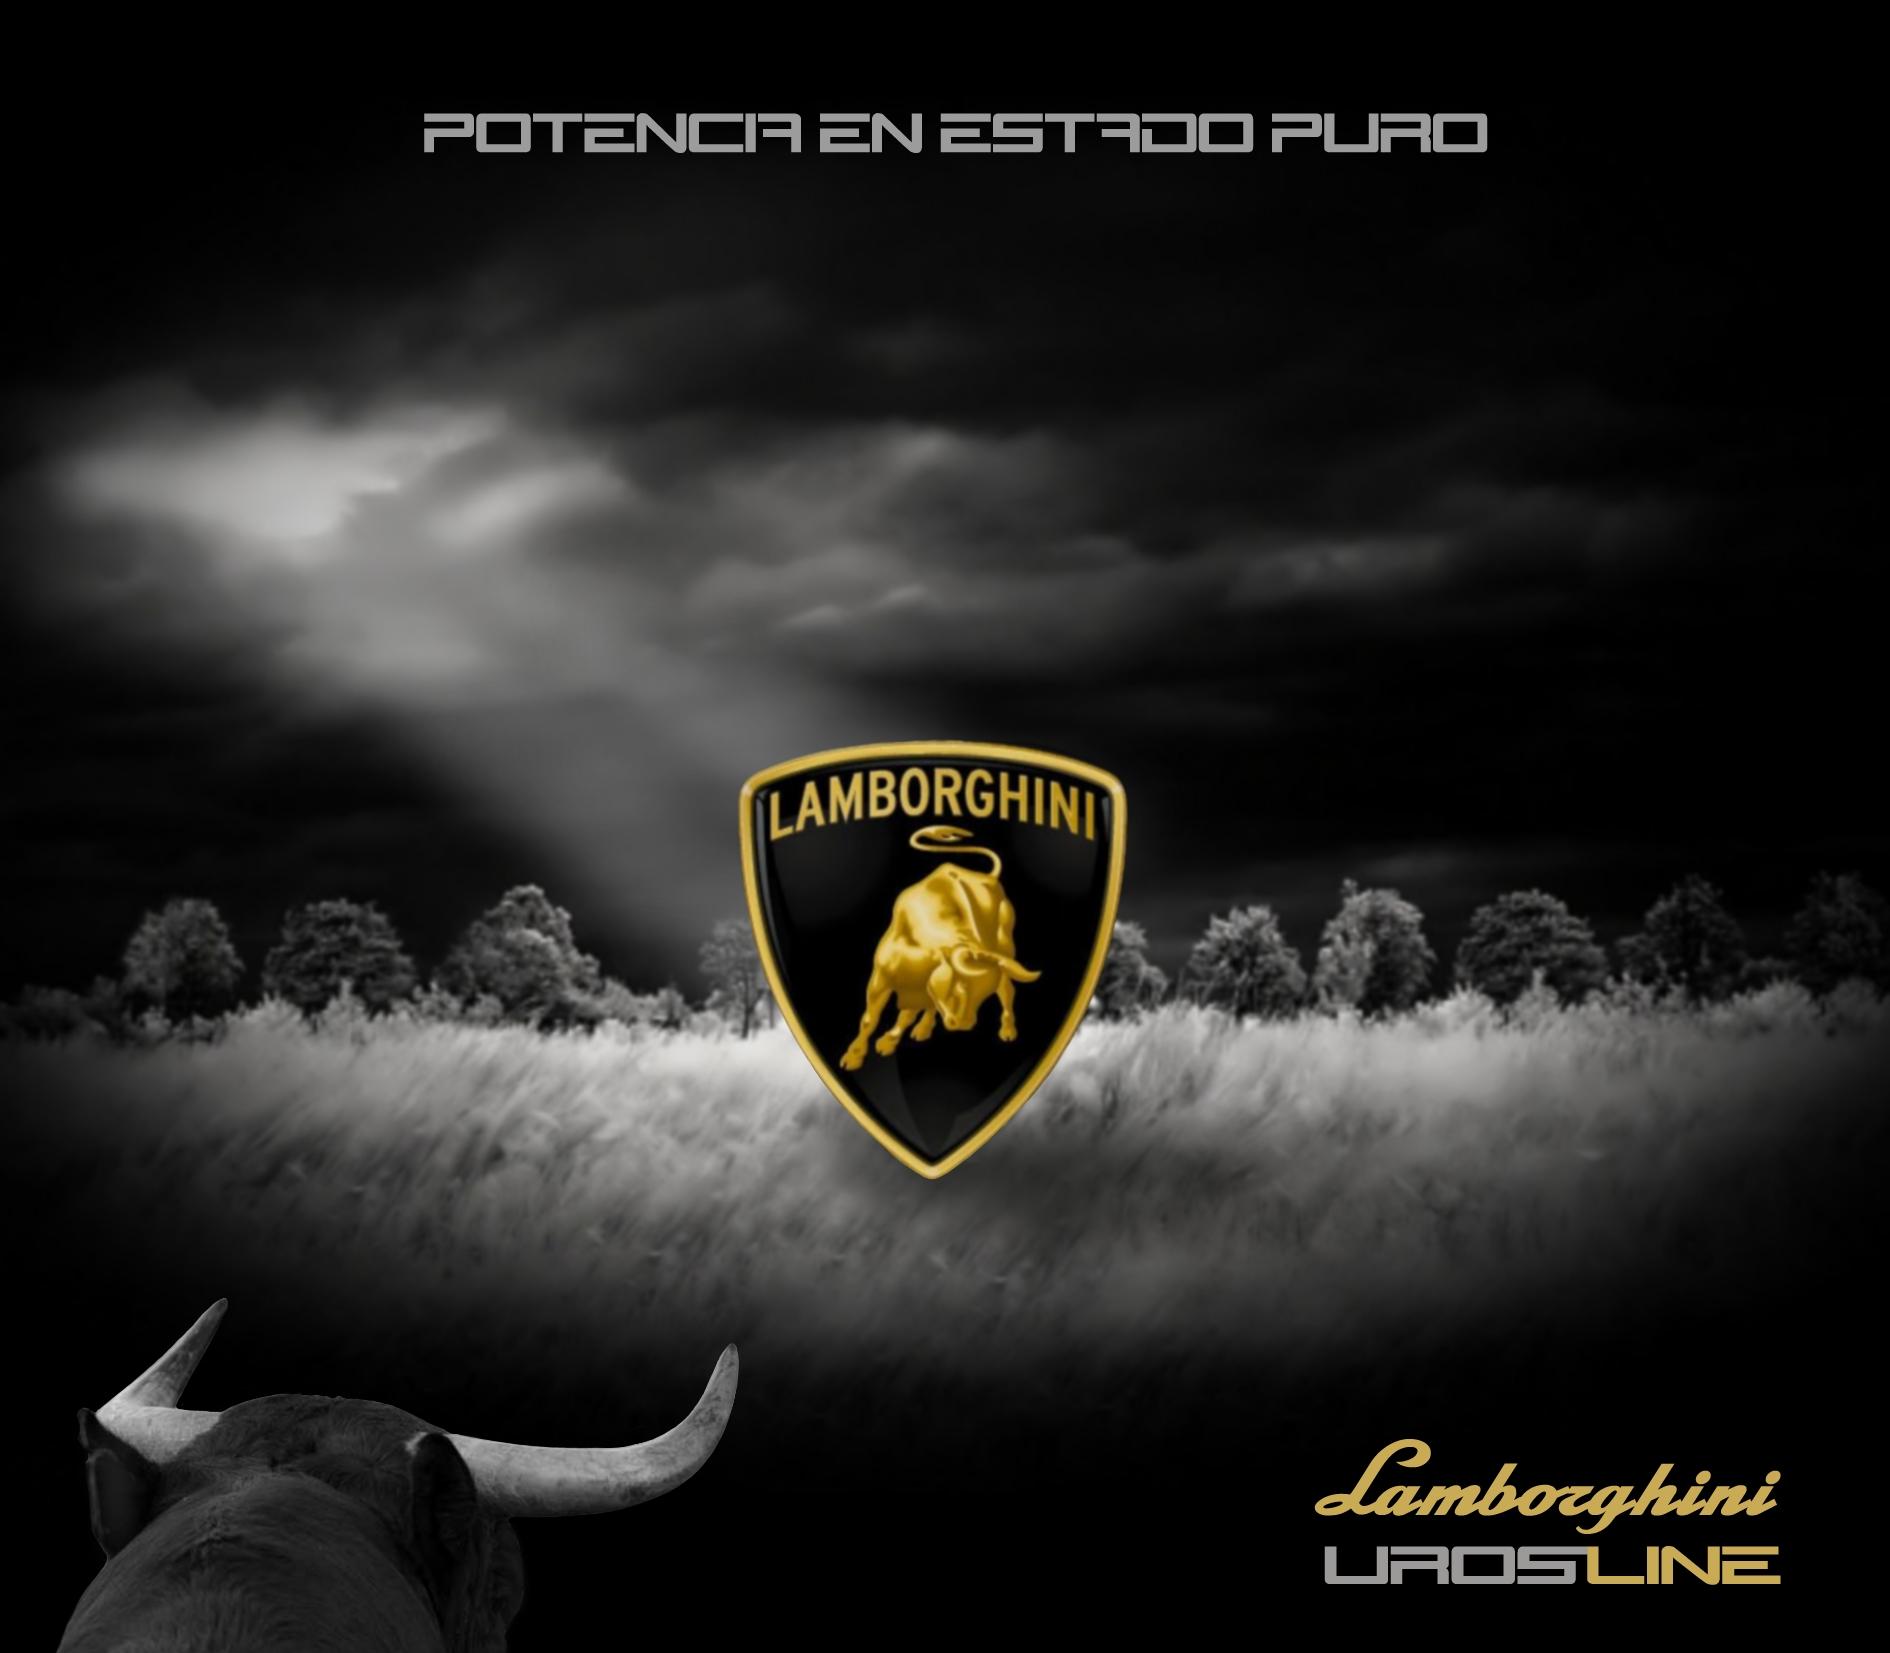 download Lamborghini Logo Wallpaper 3d YOLEDINPW [1890x1653 1890x1653